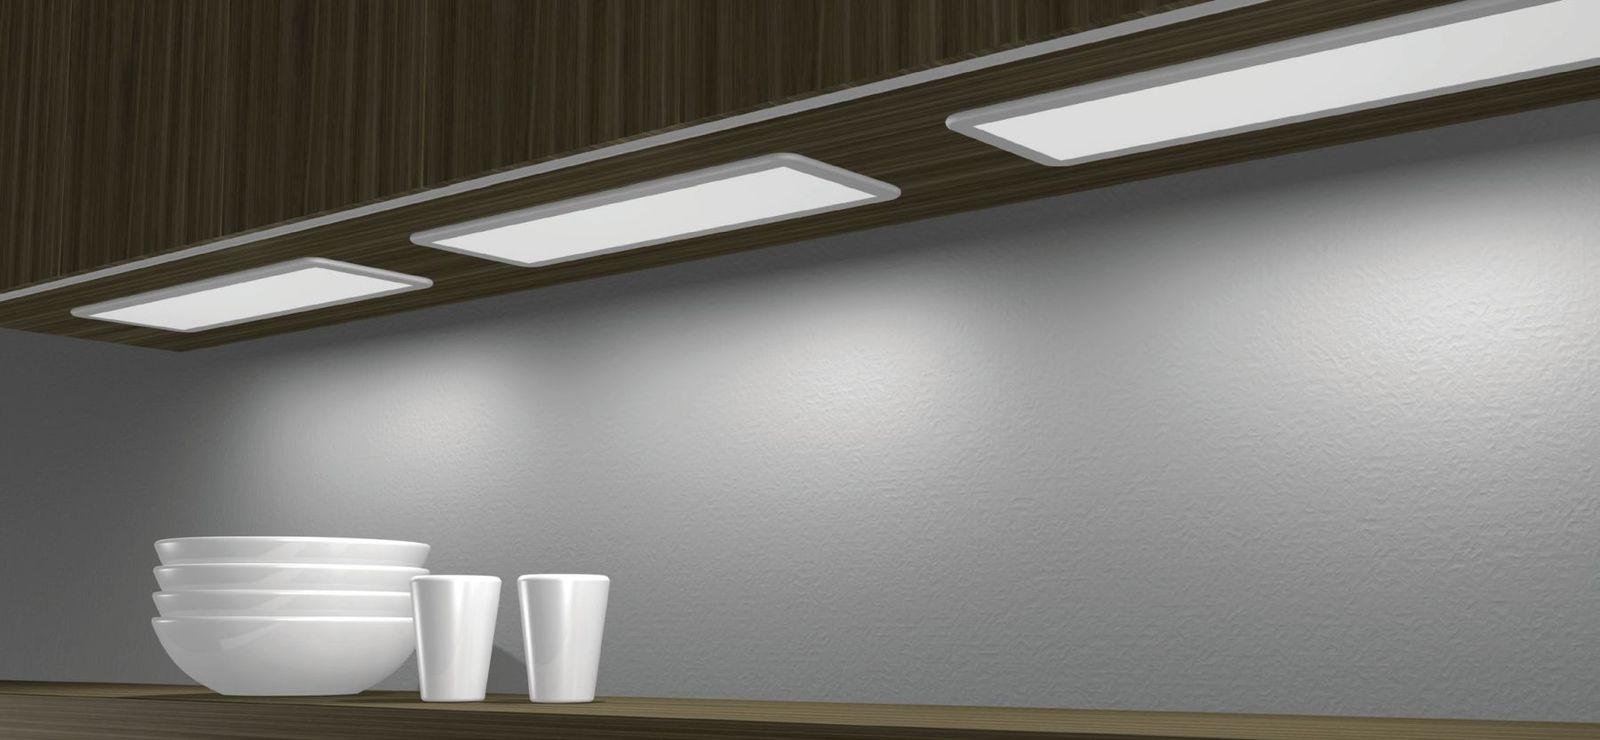 led k chen unterbauleuchte ikea. Black Bedroom Furniture Sets. Home Design Ideas